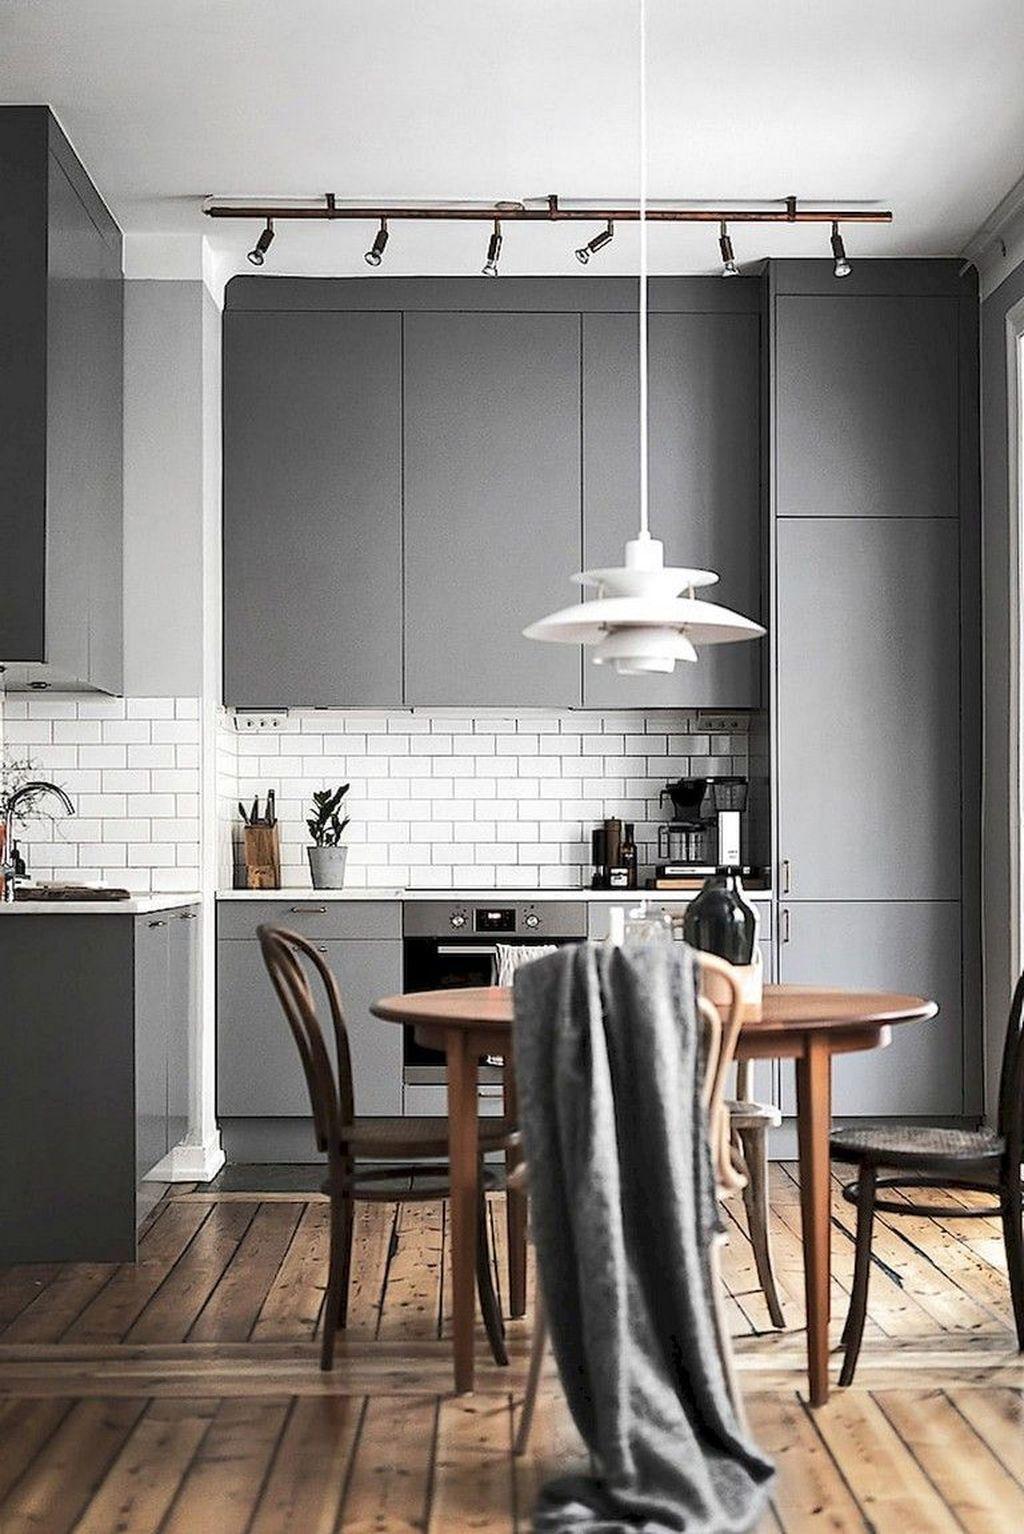 42 The Best Modern Scandinavian Kitchen Design Ideas Scandinavian Kitchen Design Minimalist Kitchen Design Small Modern Kitchens